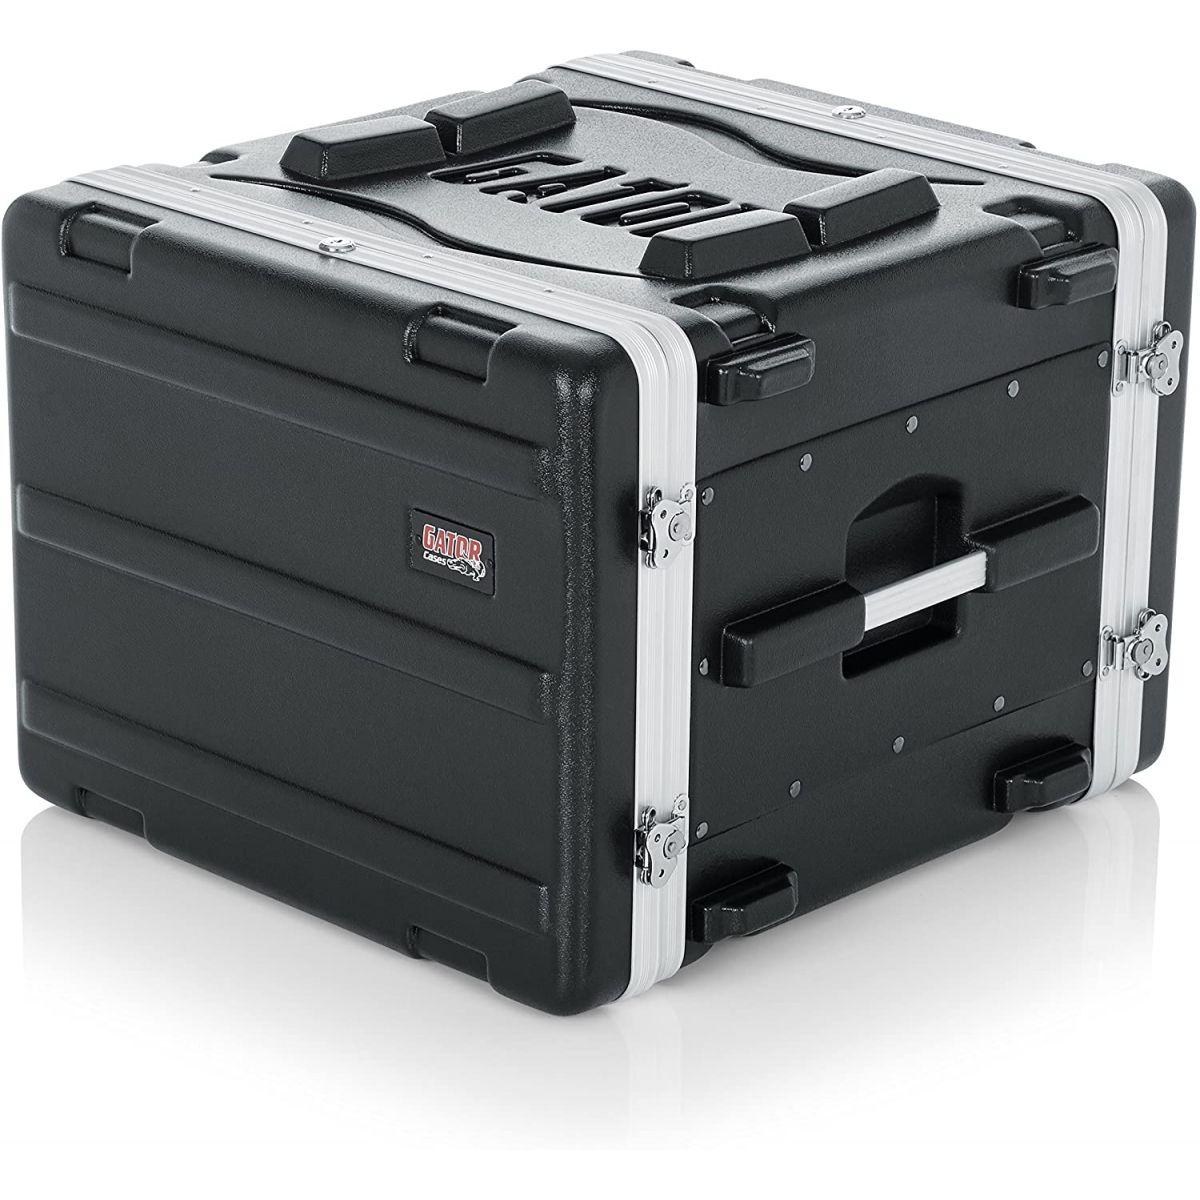 Flight cases rackables ABS - Gator - GR-8L